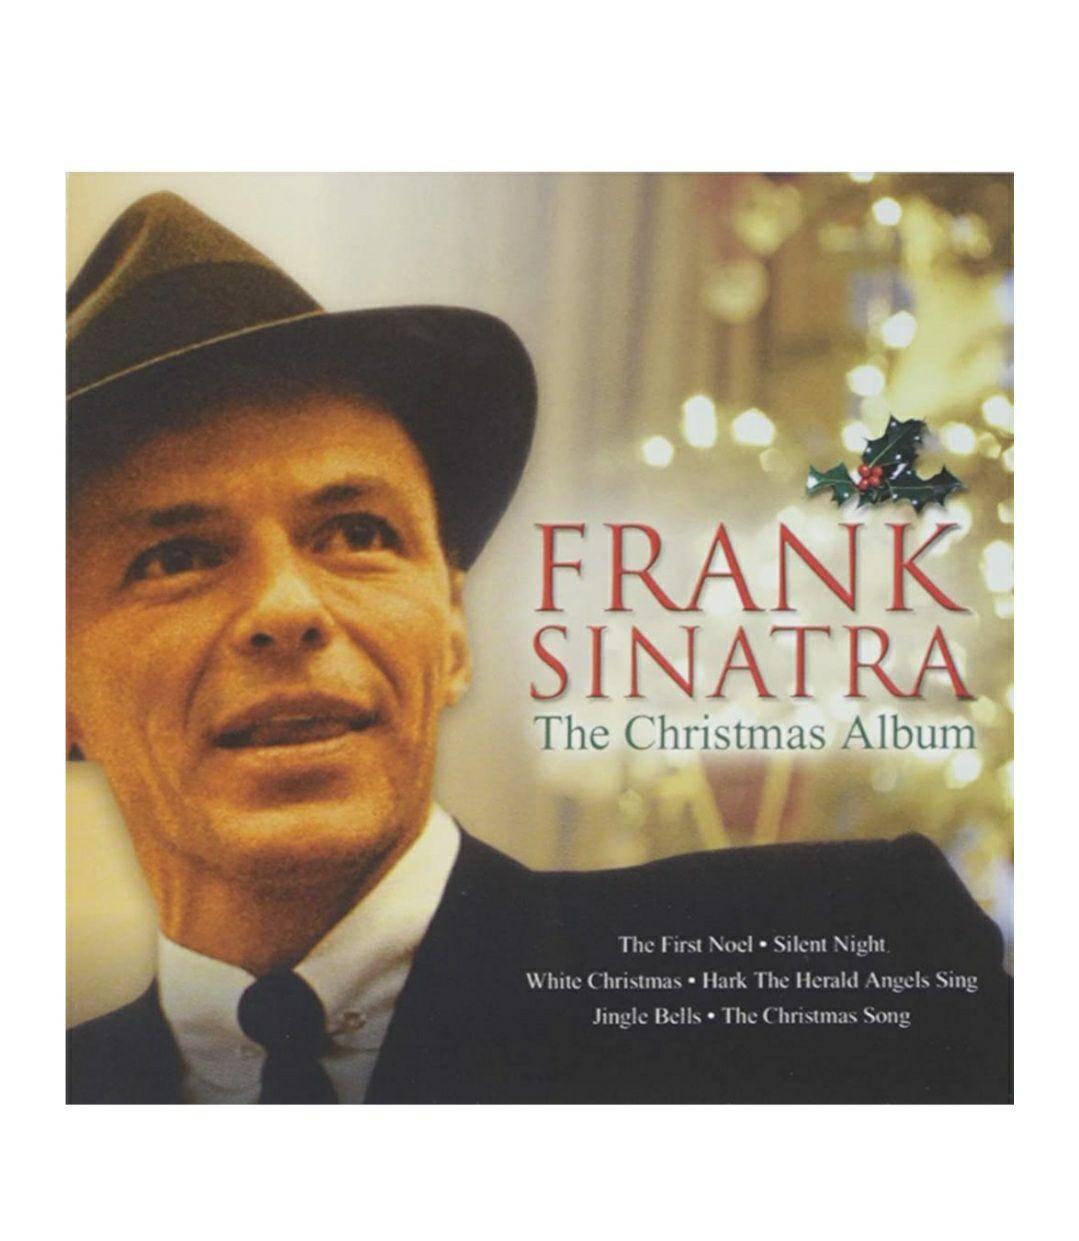 sinatra christmas album (CD audio)